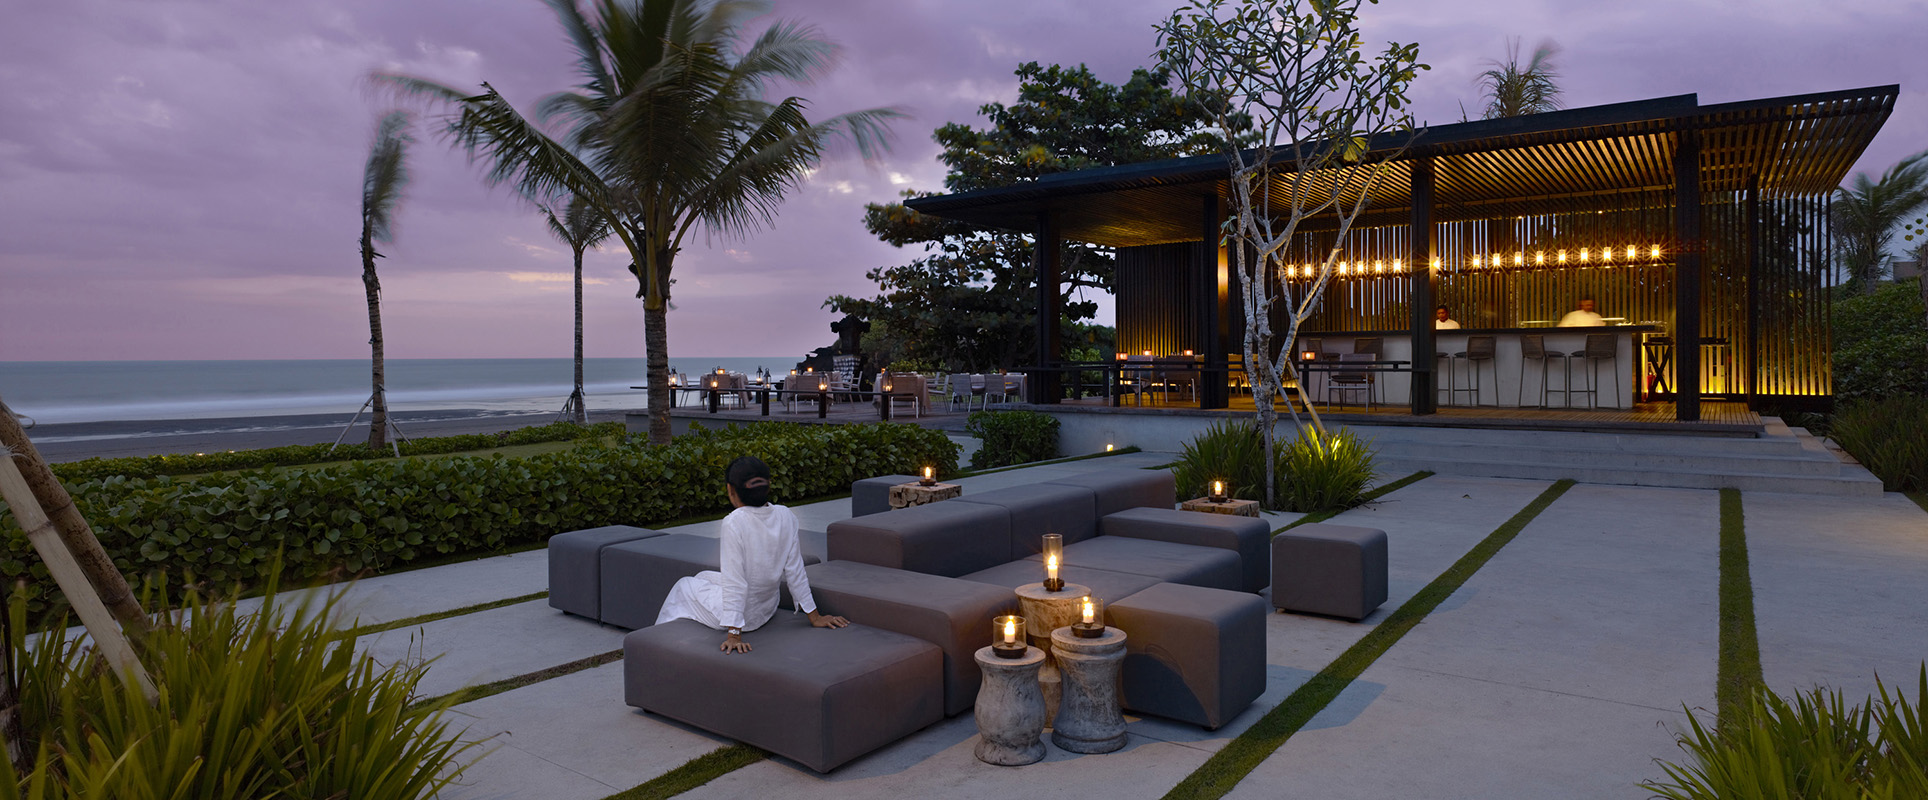 adelaparvu.com despre Alila Villas Soori Foto Design Hotels (25)